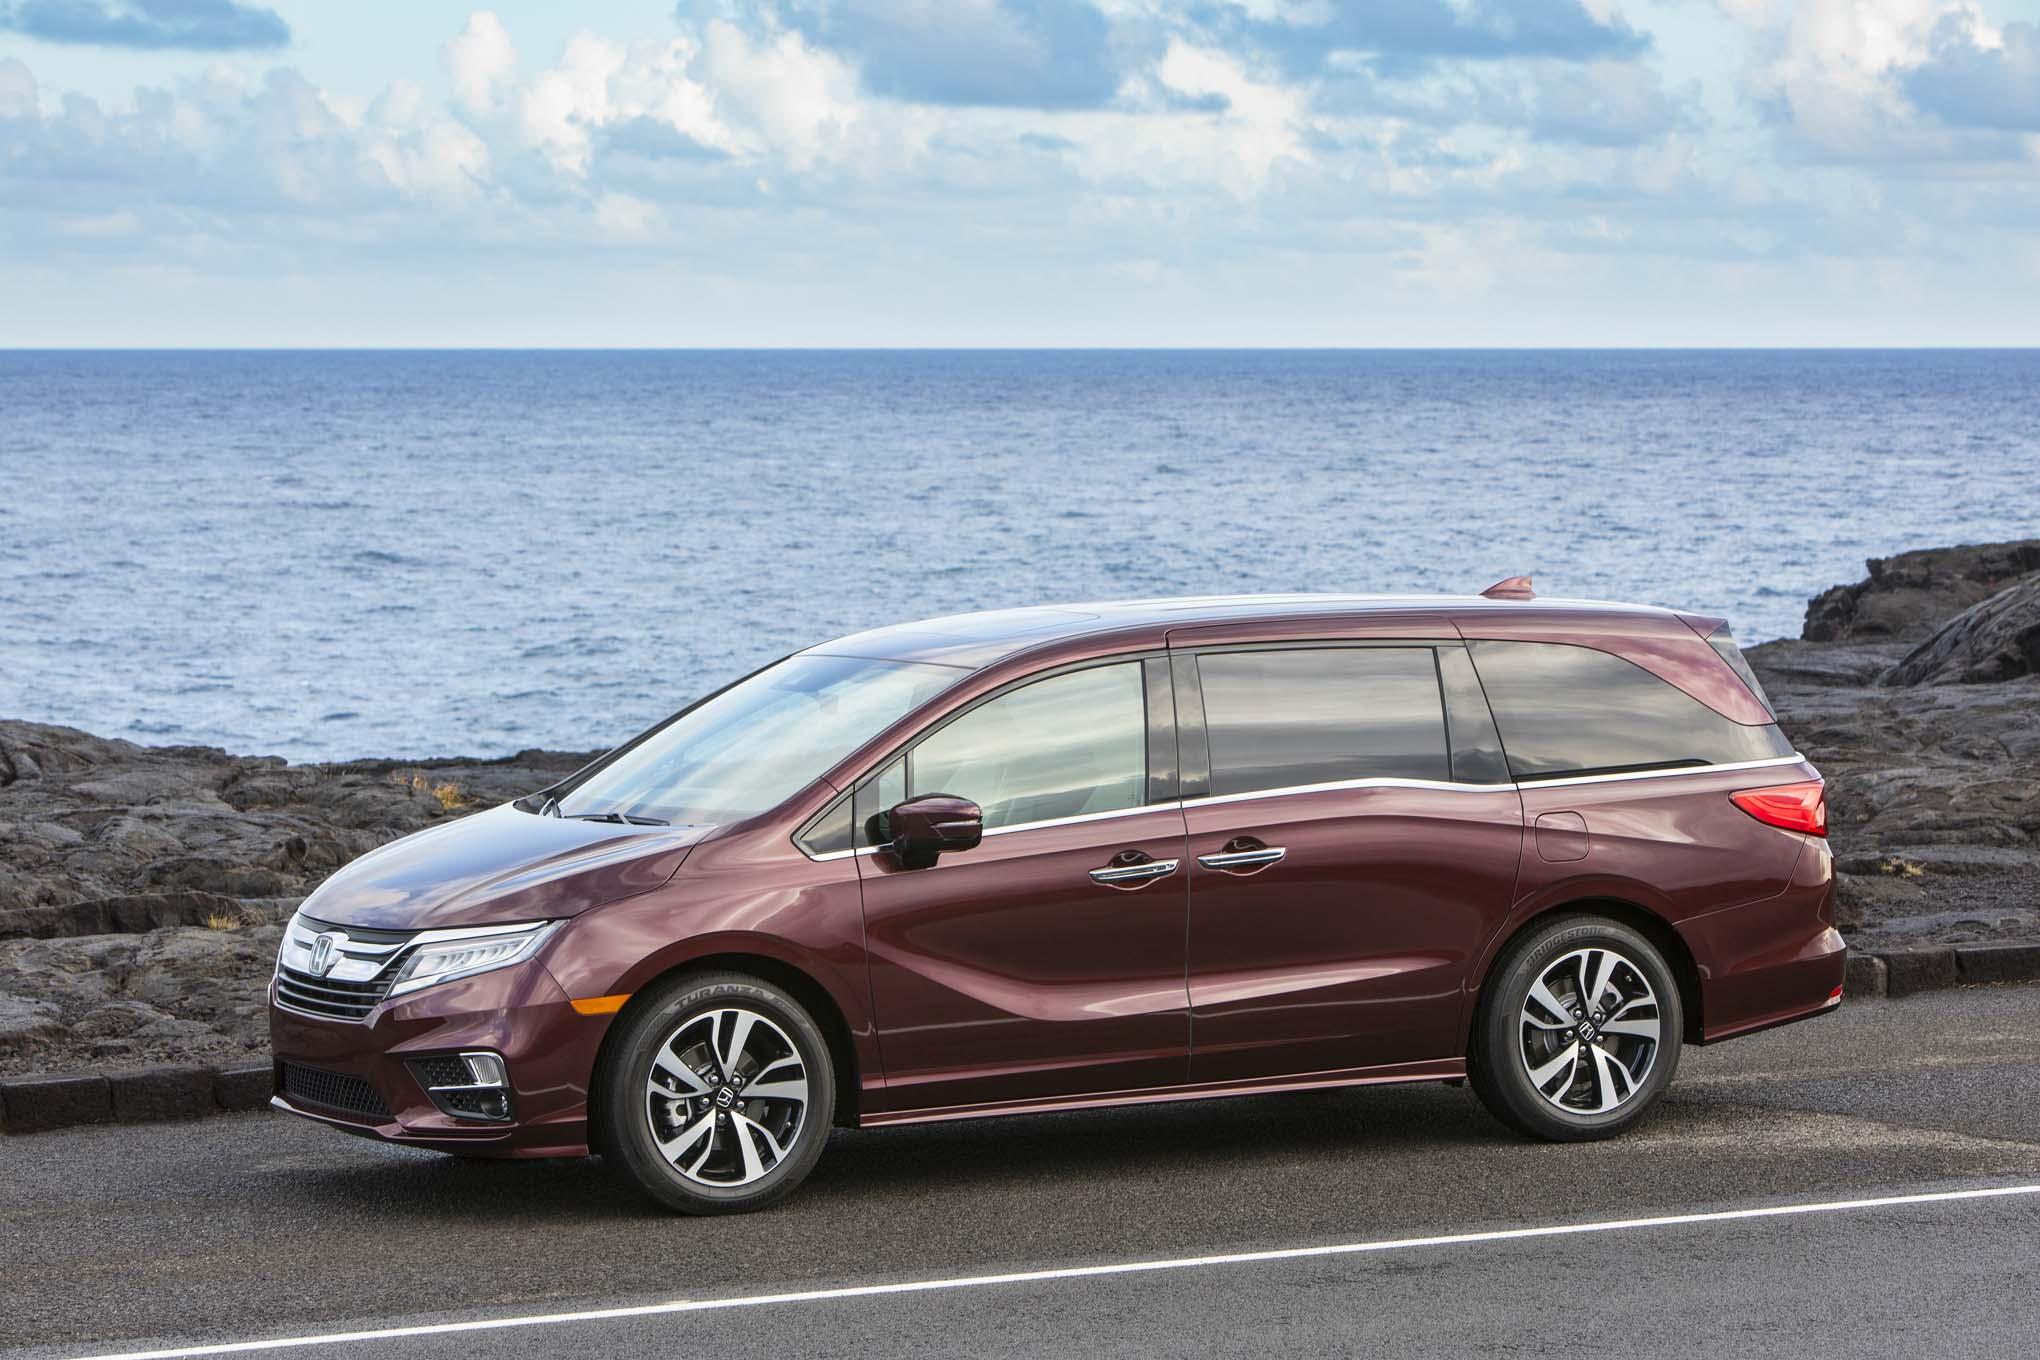 2018 Honda Odyssey Front Three Quarter 10